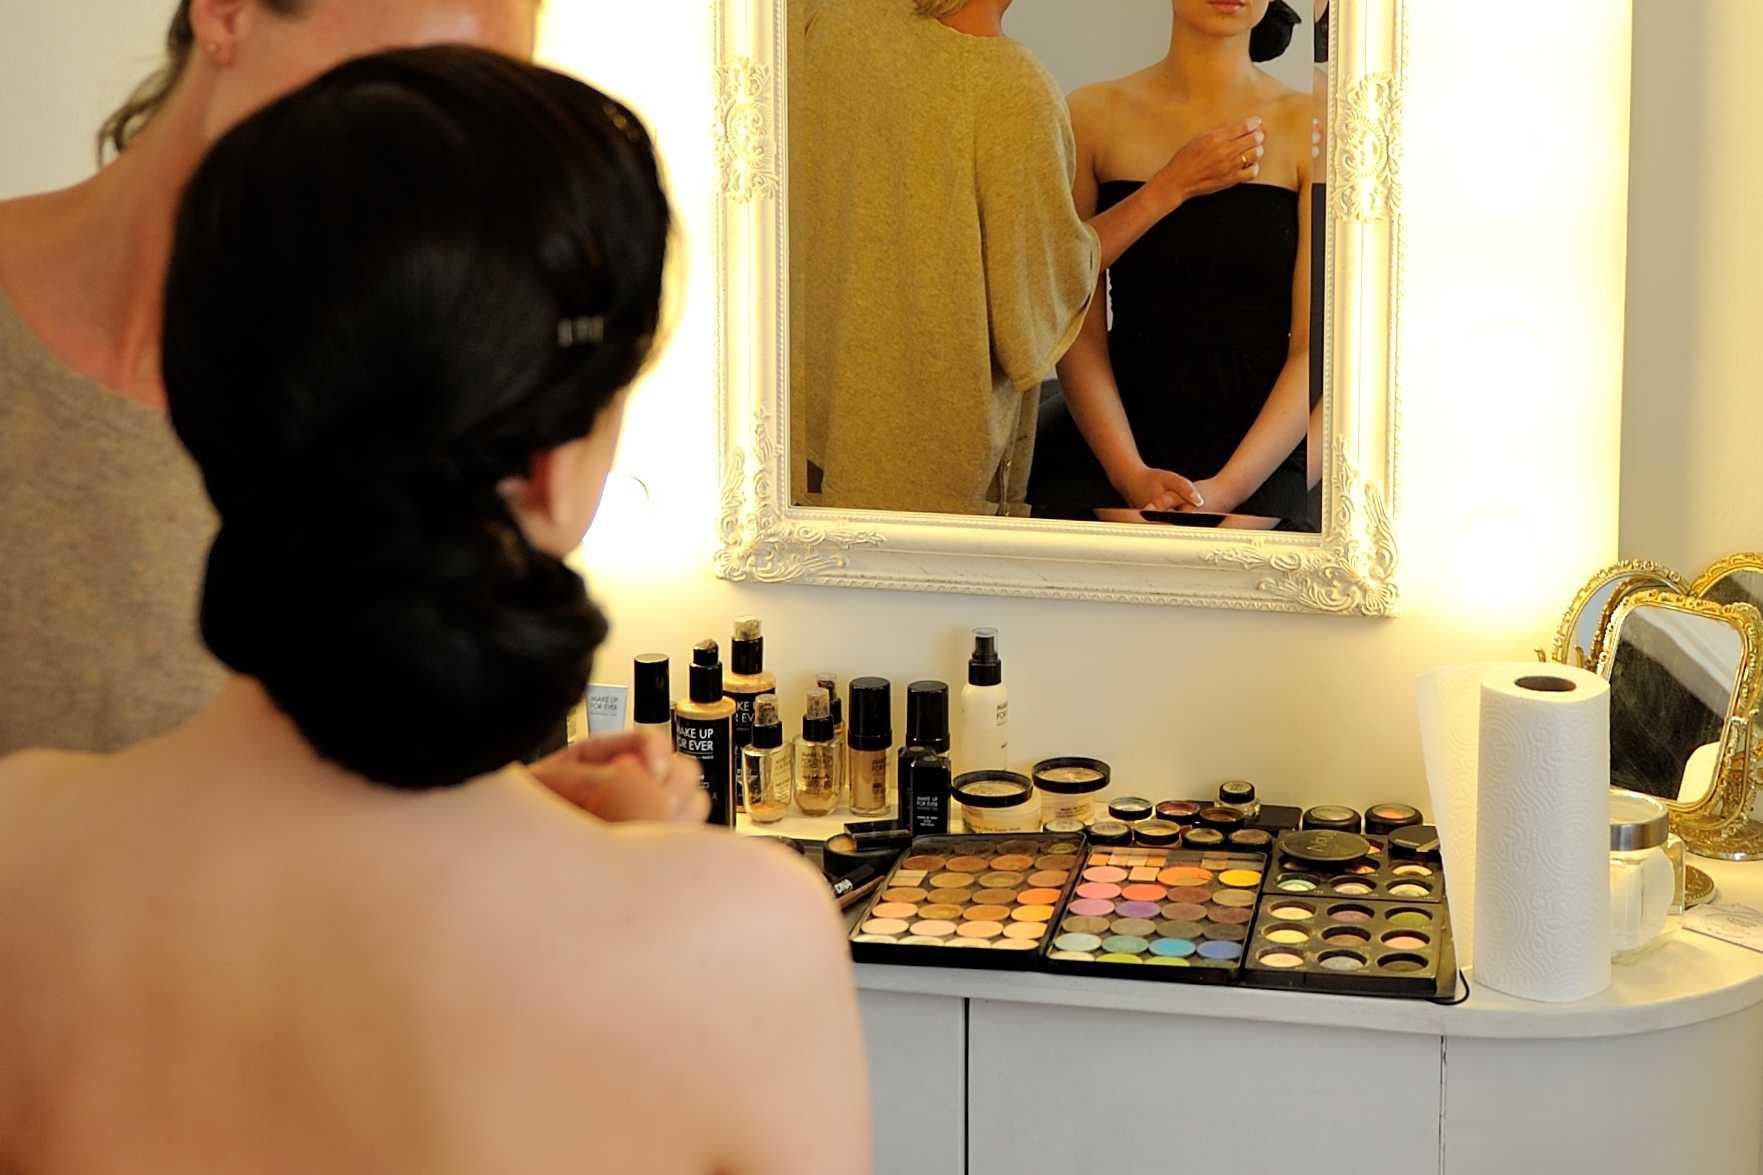 Jaunosios makiažo paslaptys - www.vestuviupadejejas.lt